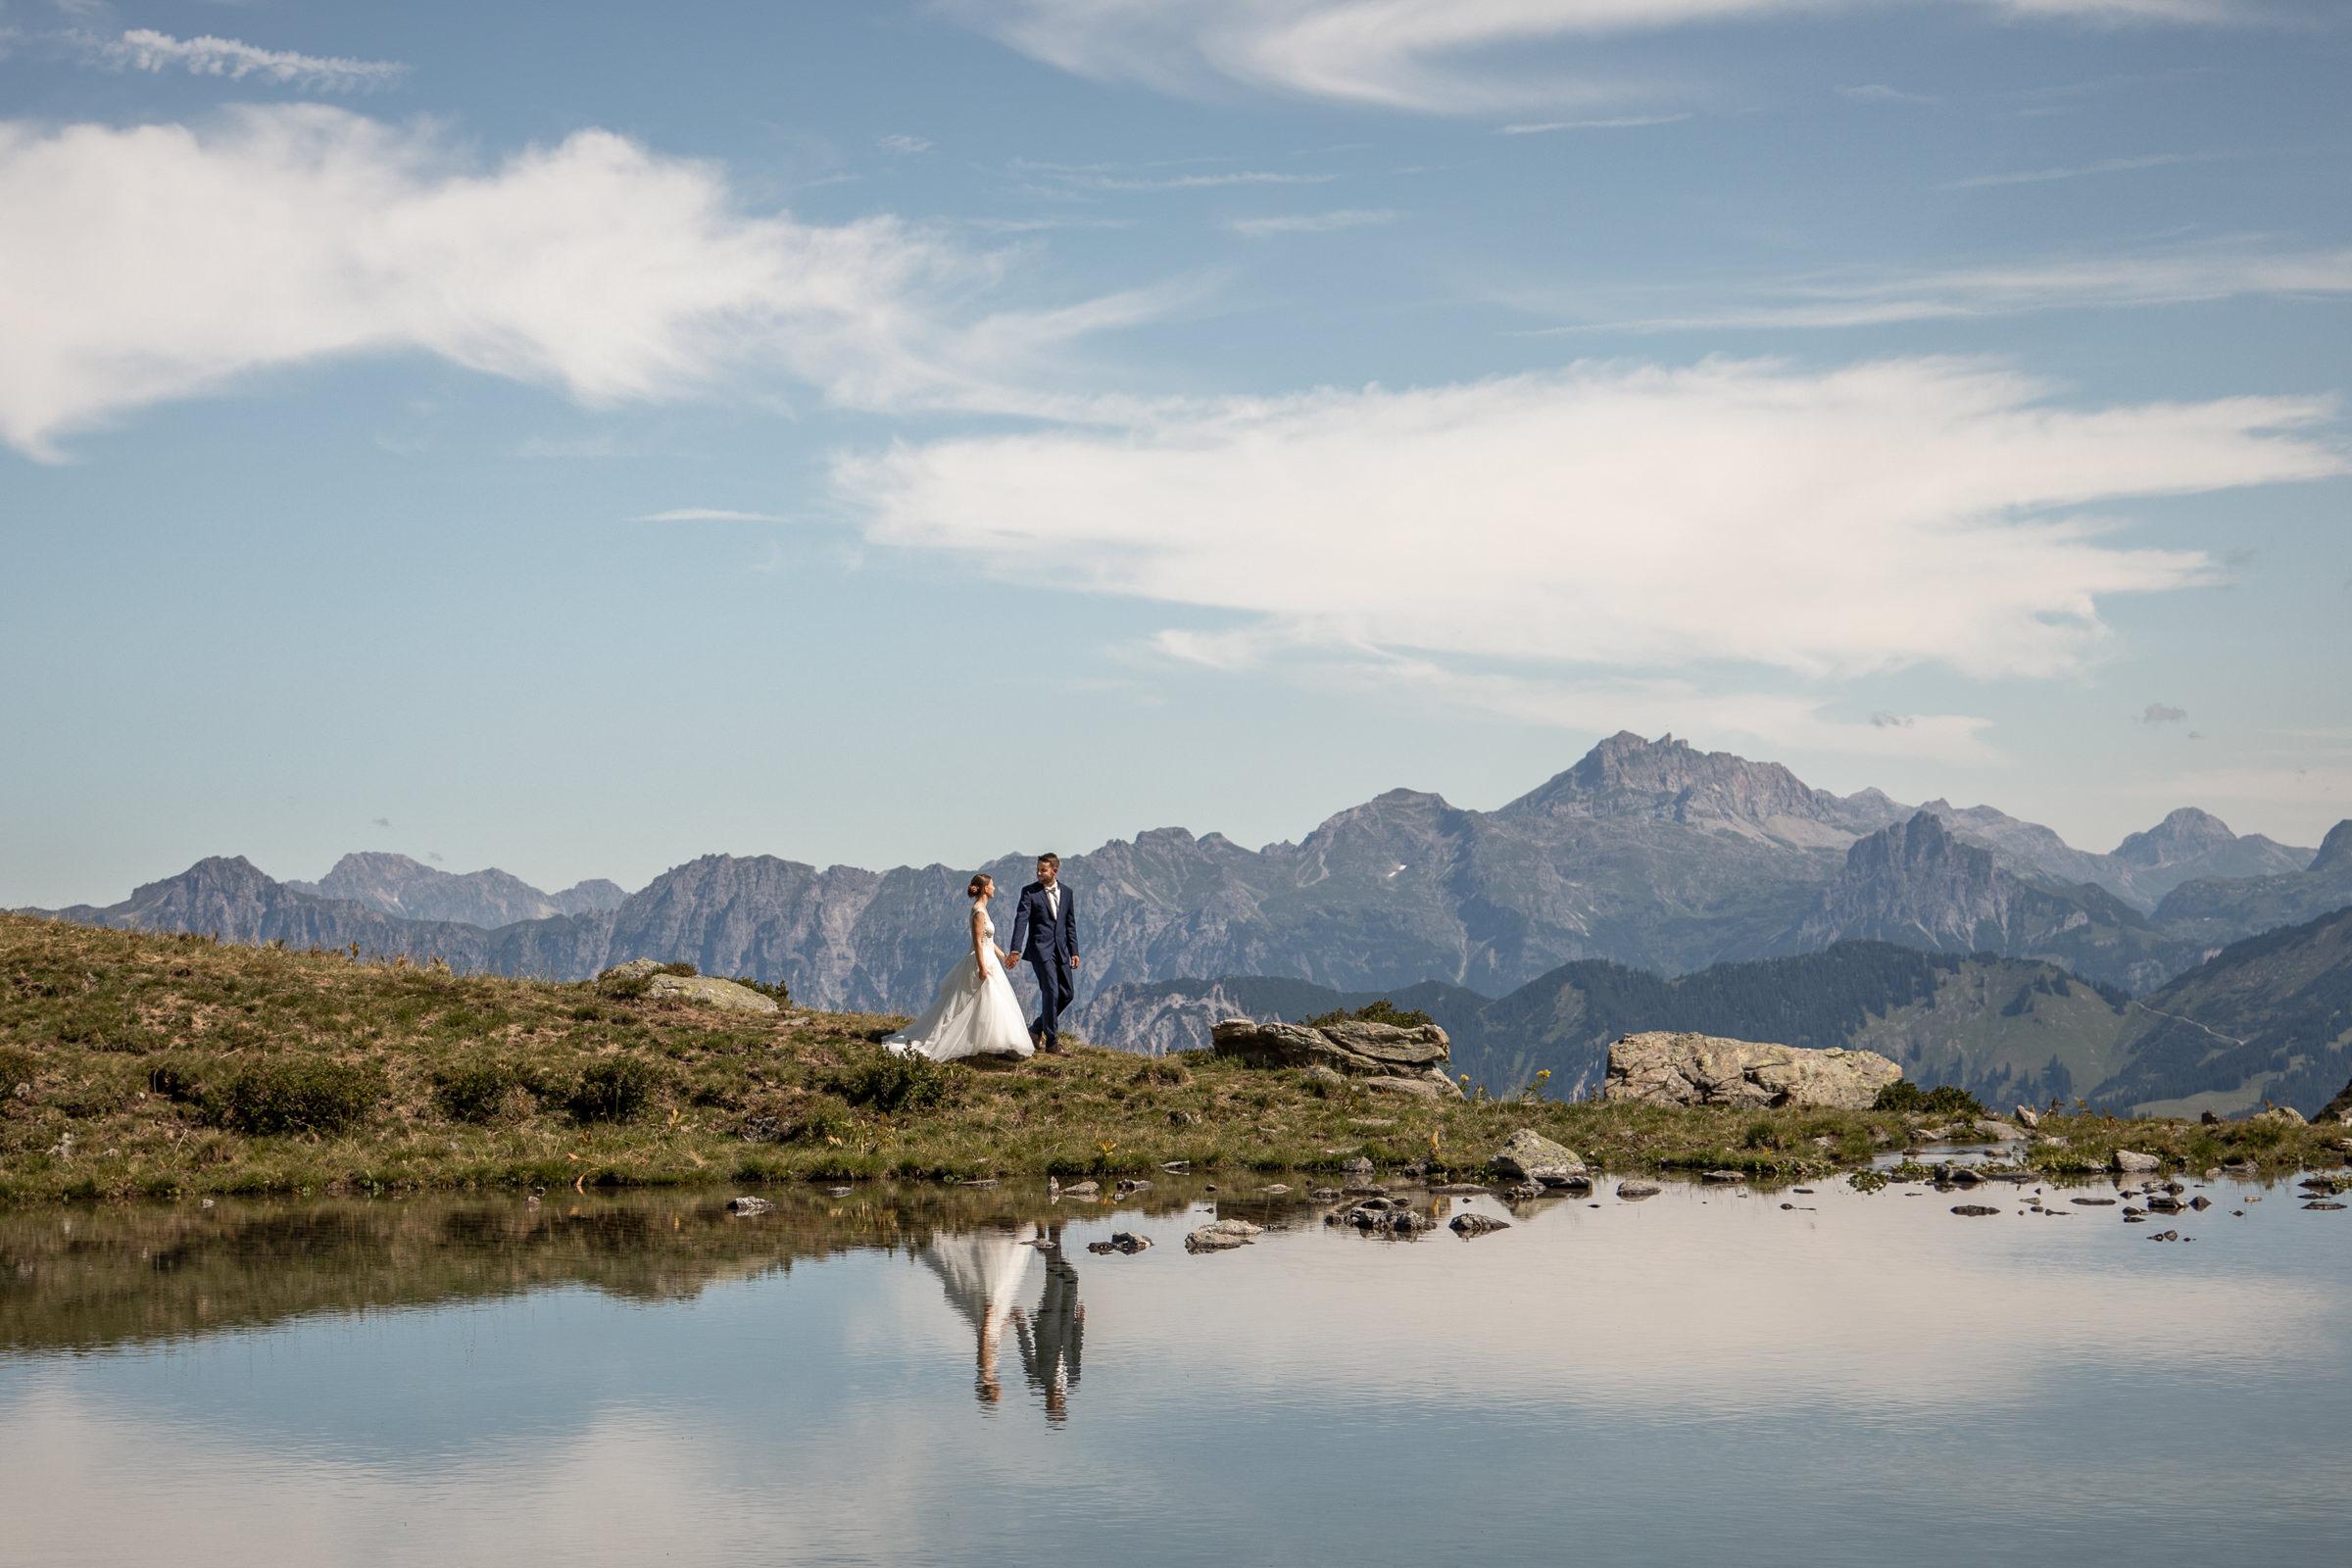 wedding photos in montafon in vorarlberg